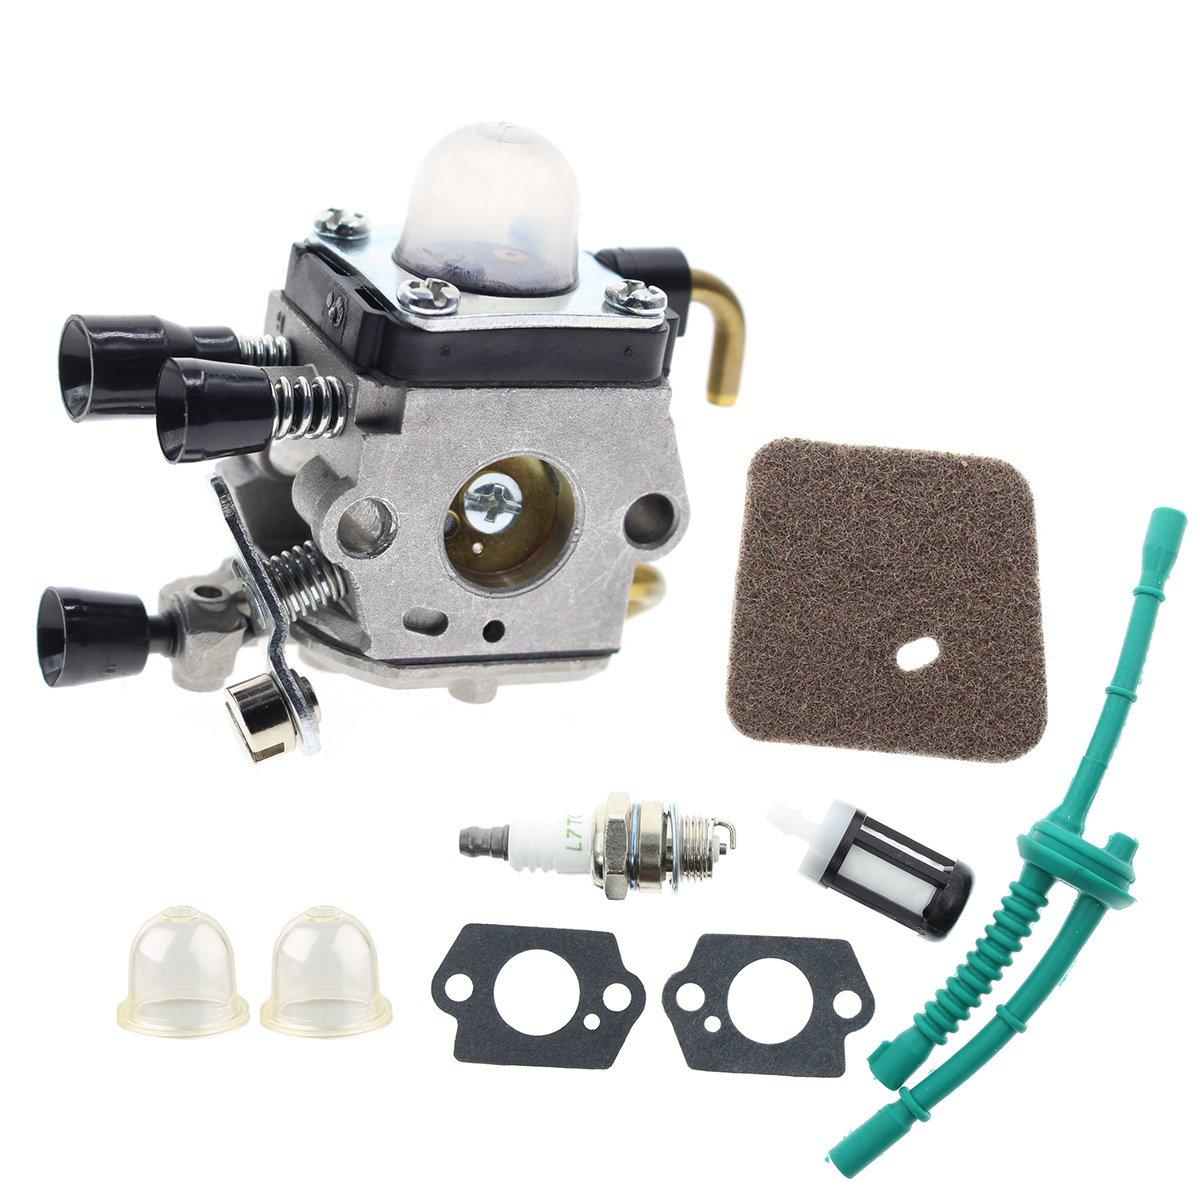 AUTOKAY New Carburetor For Stihl FS45 FS46 FS55 FC55 FS38 FS55R FS55RC KM55 HL45 Trimmer